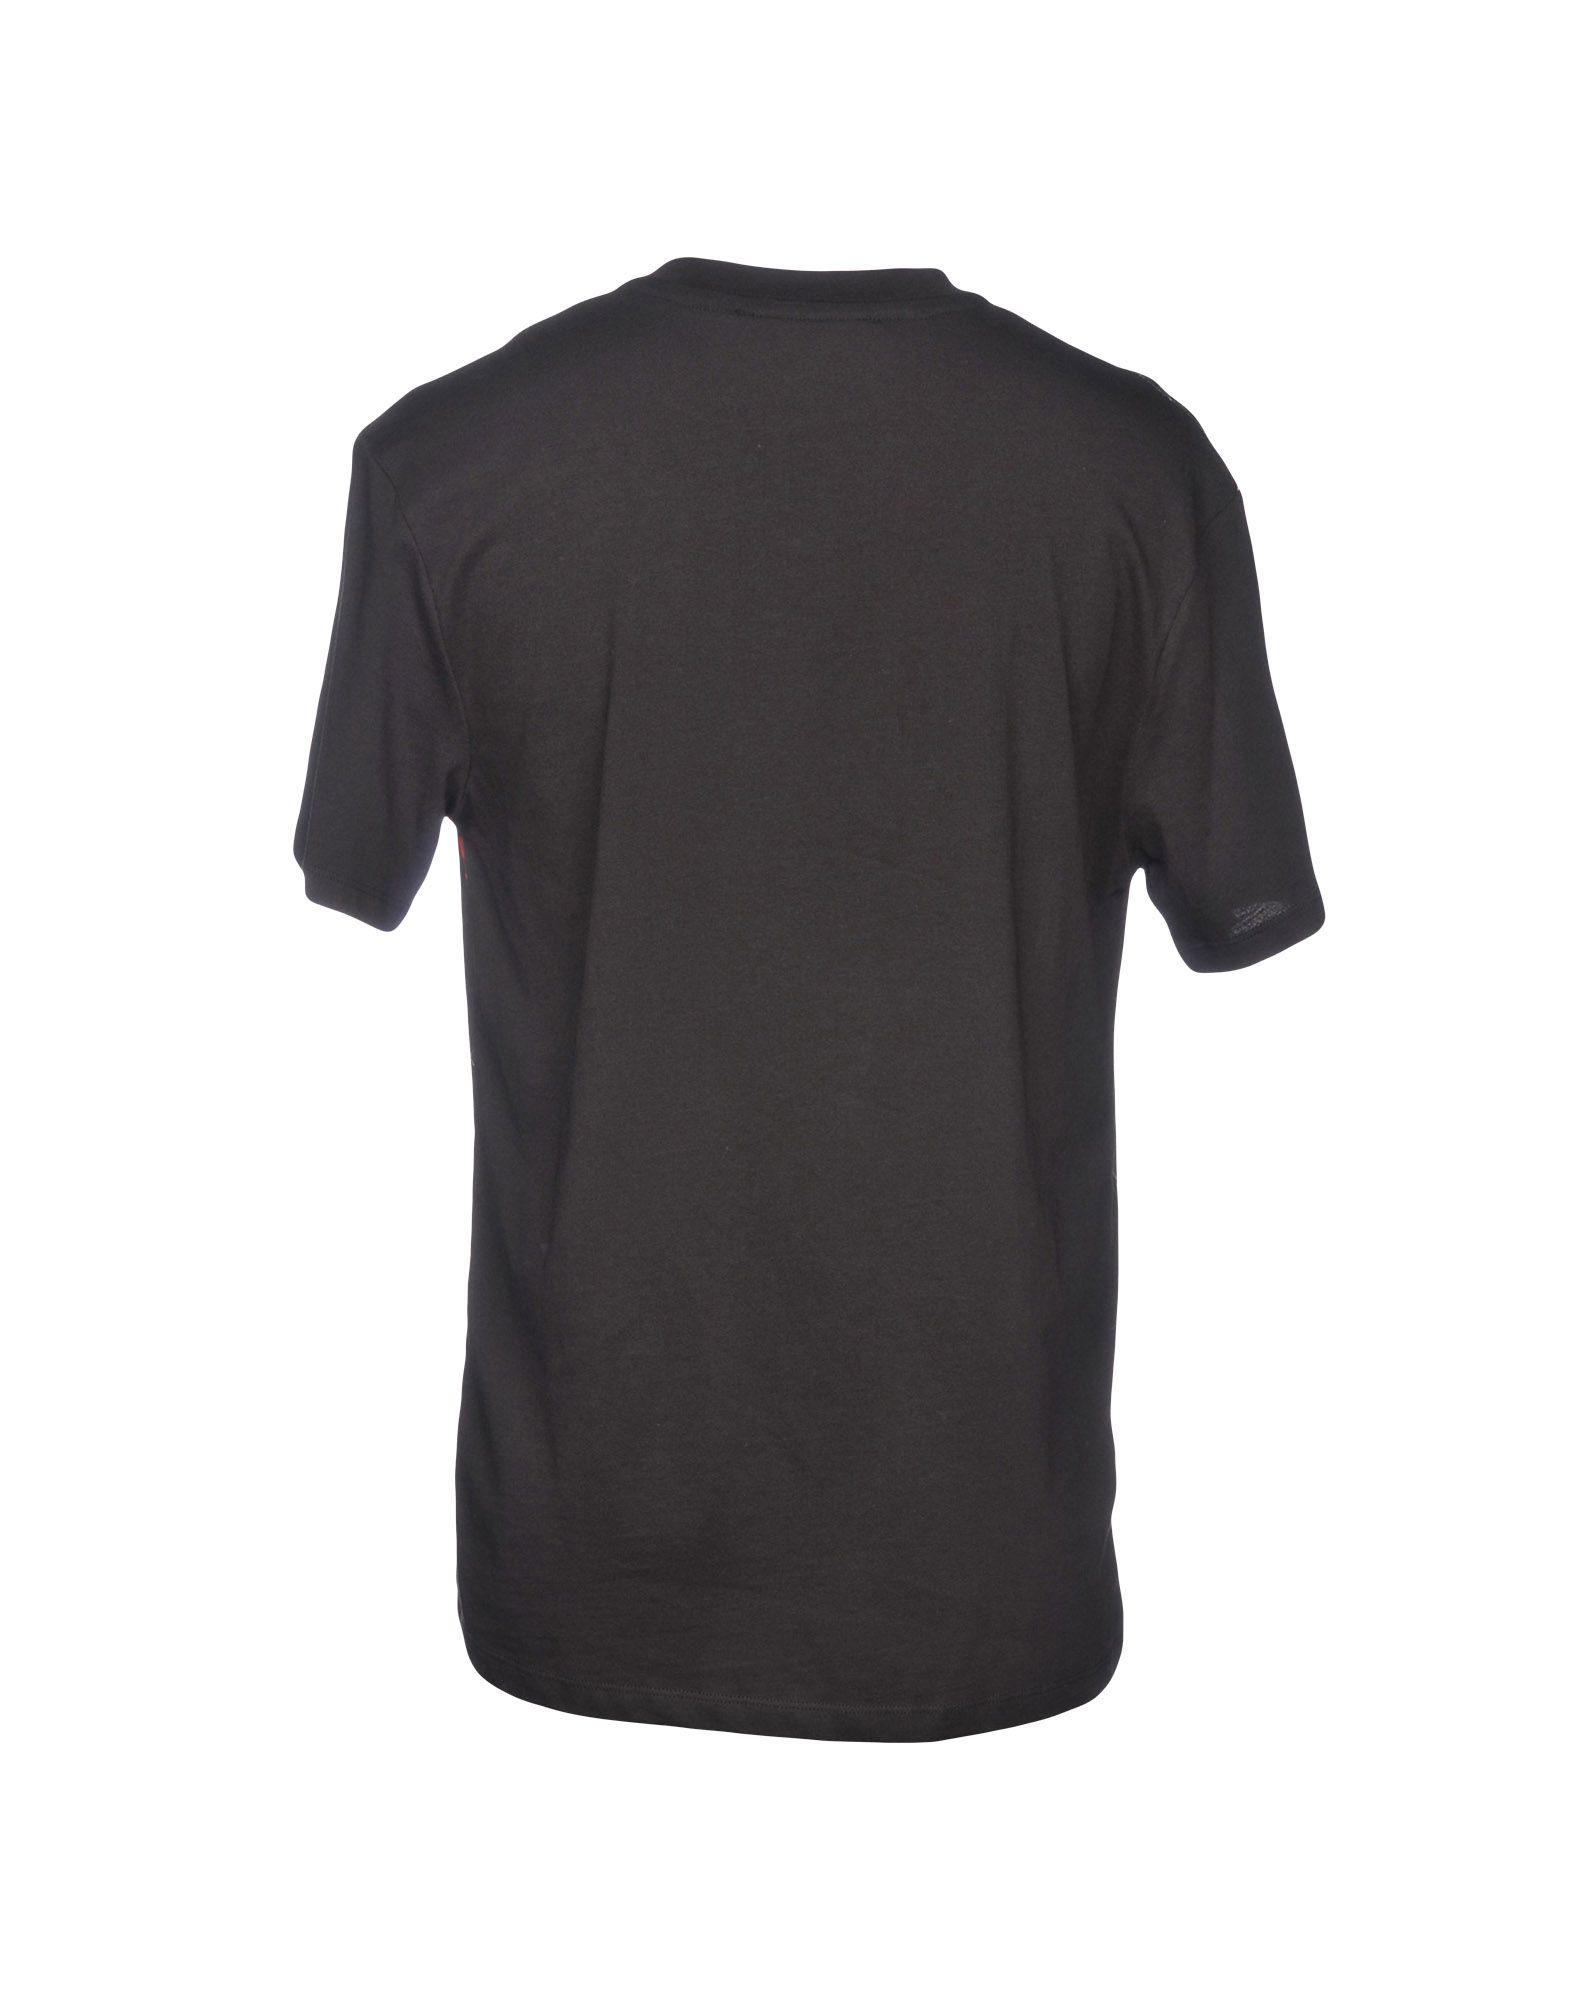 T-Shirt Mcq Alexander Mcqueen Uomo - 12199659BL 12199659BL 12199659BL fe615d